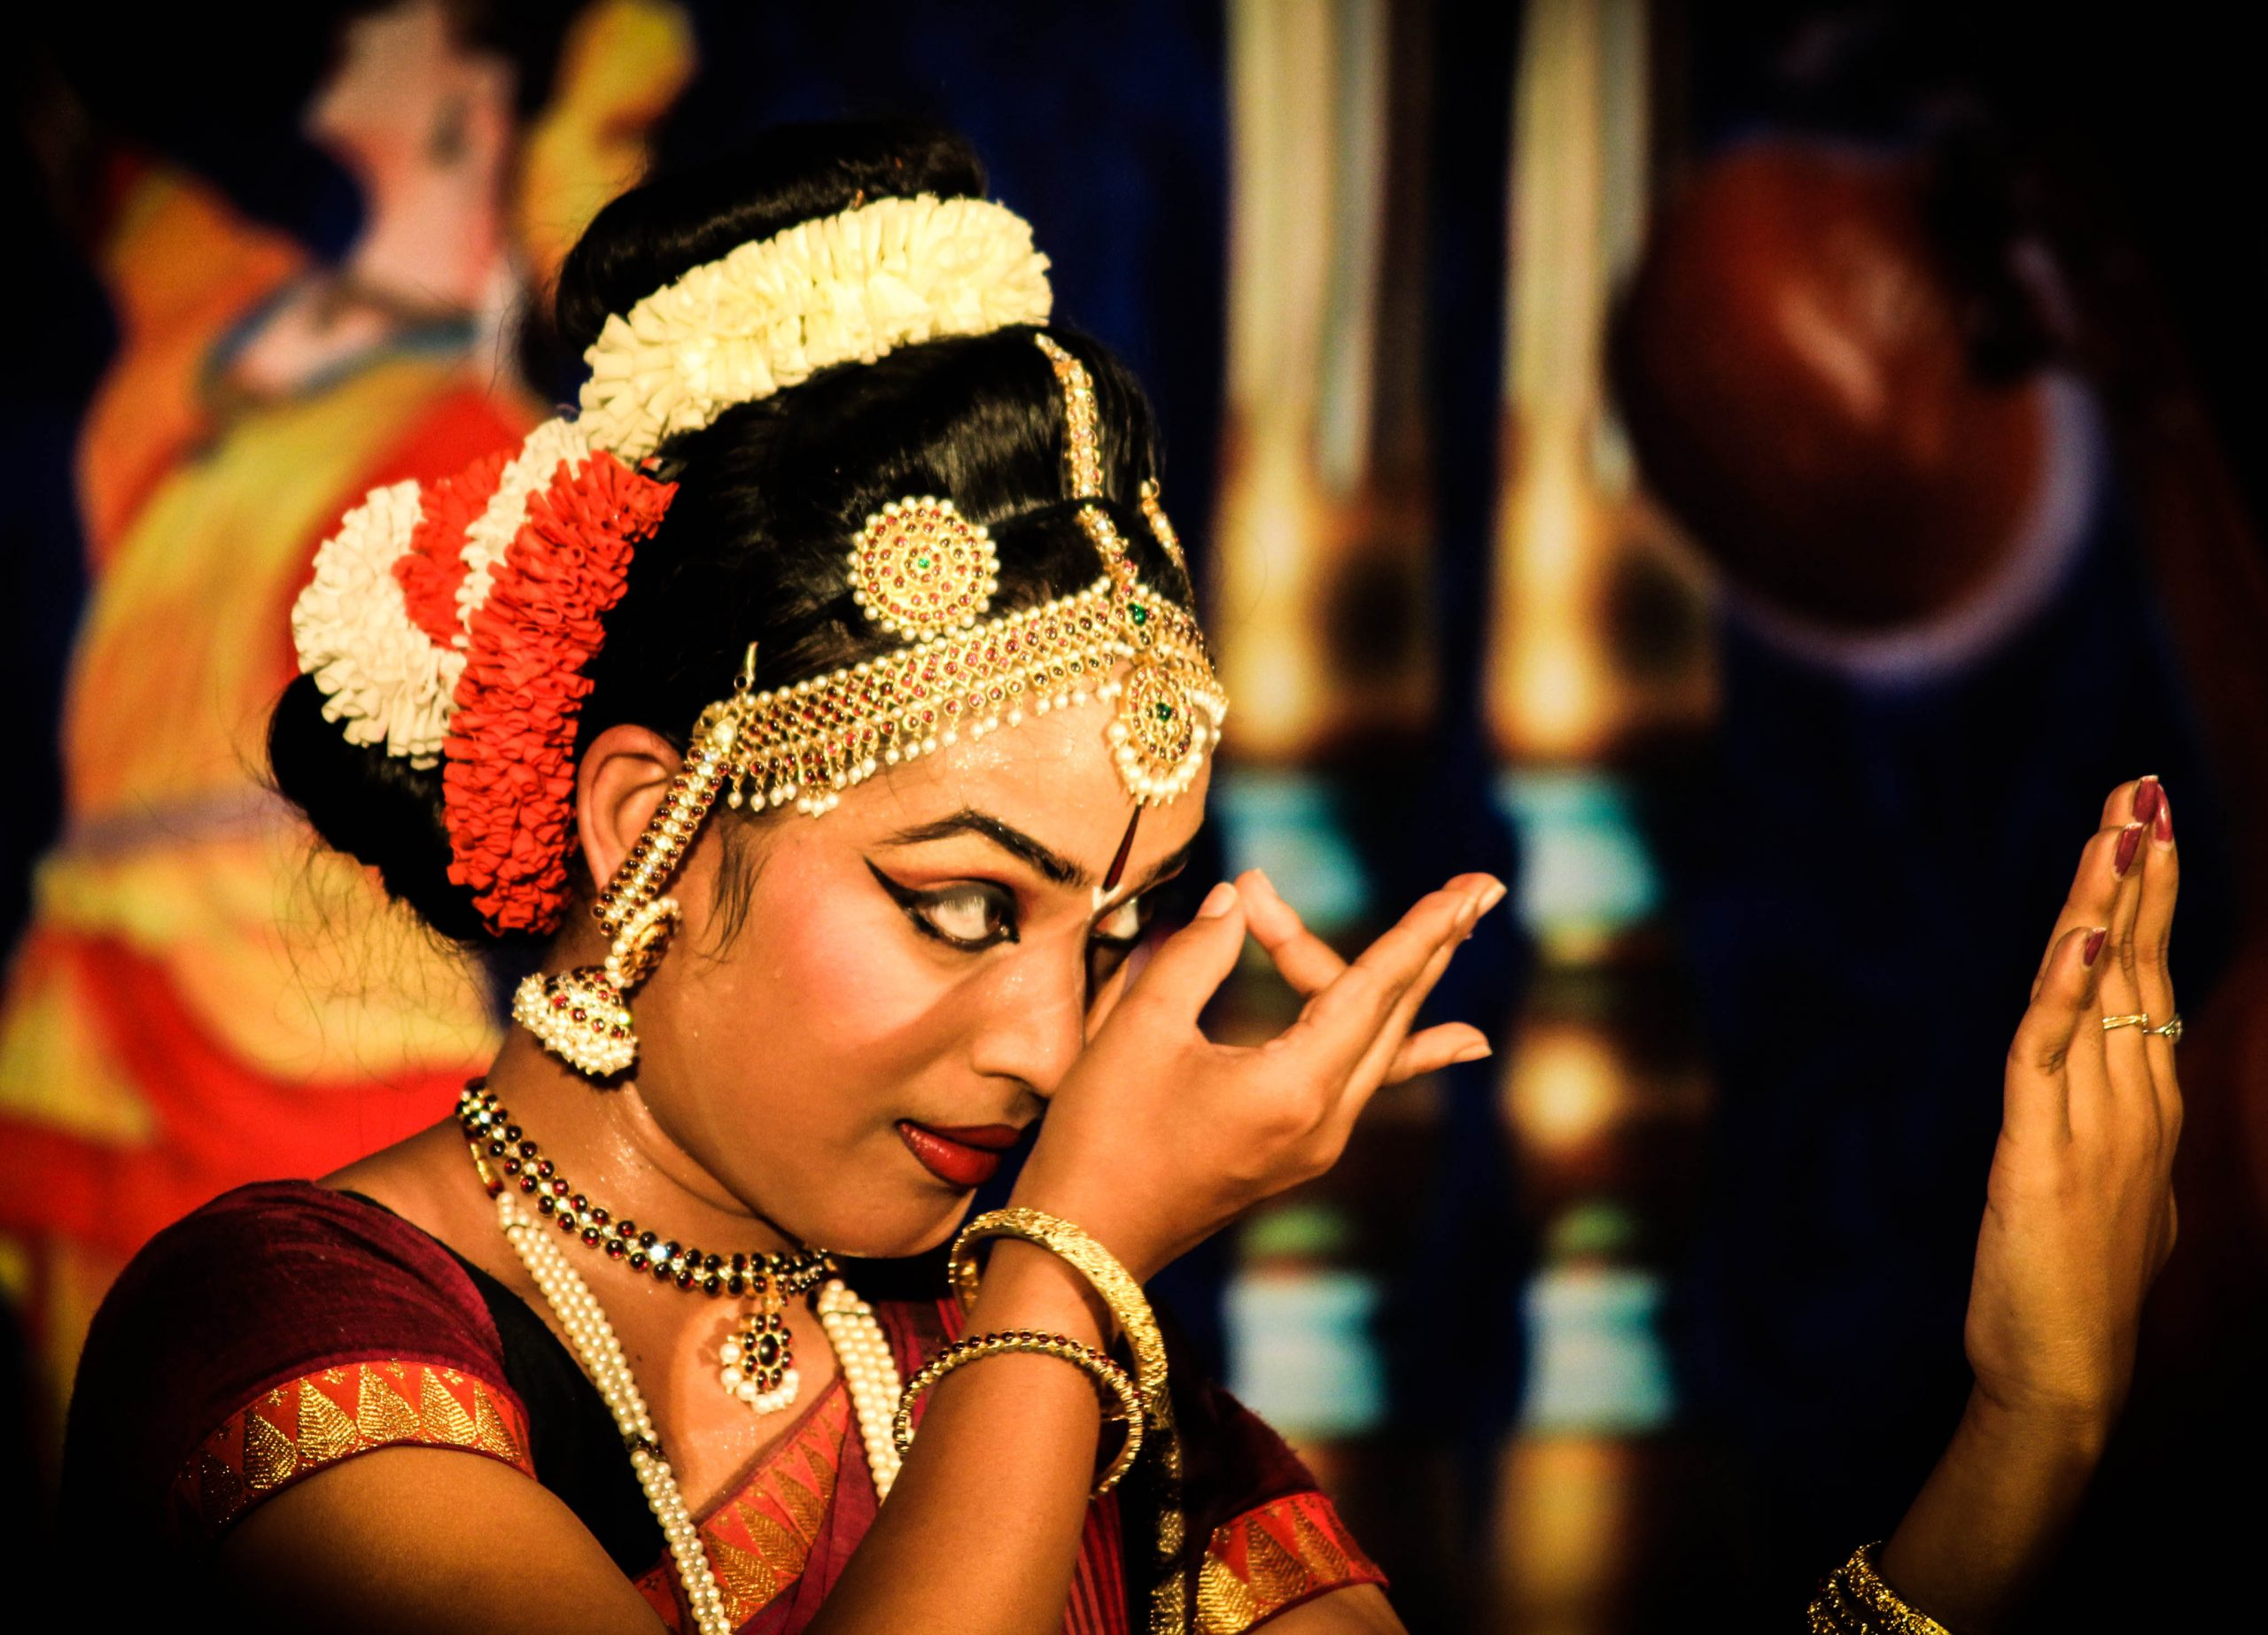 bharatnatyam performer getting ready